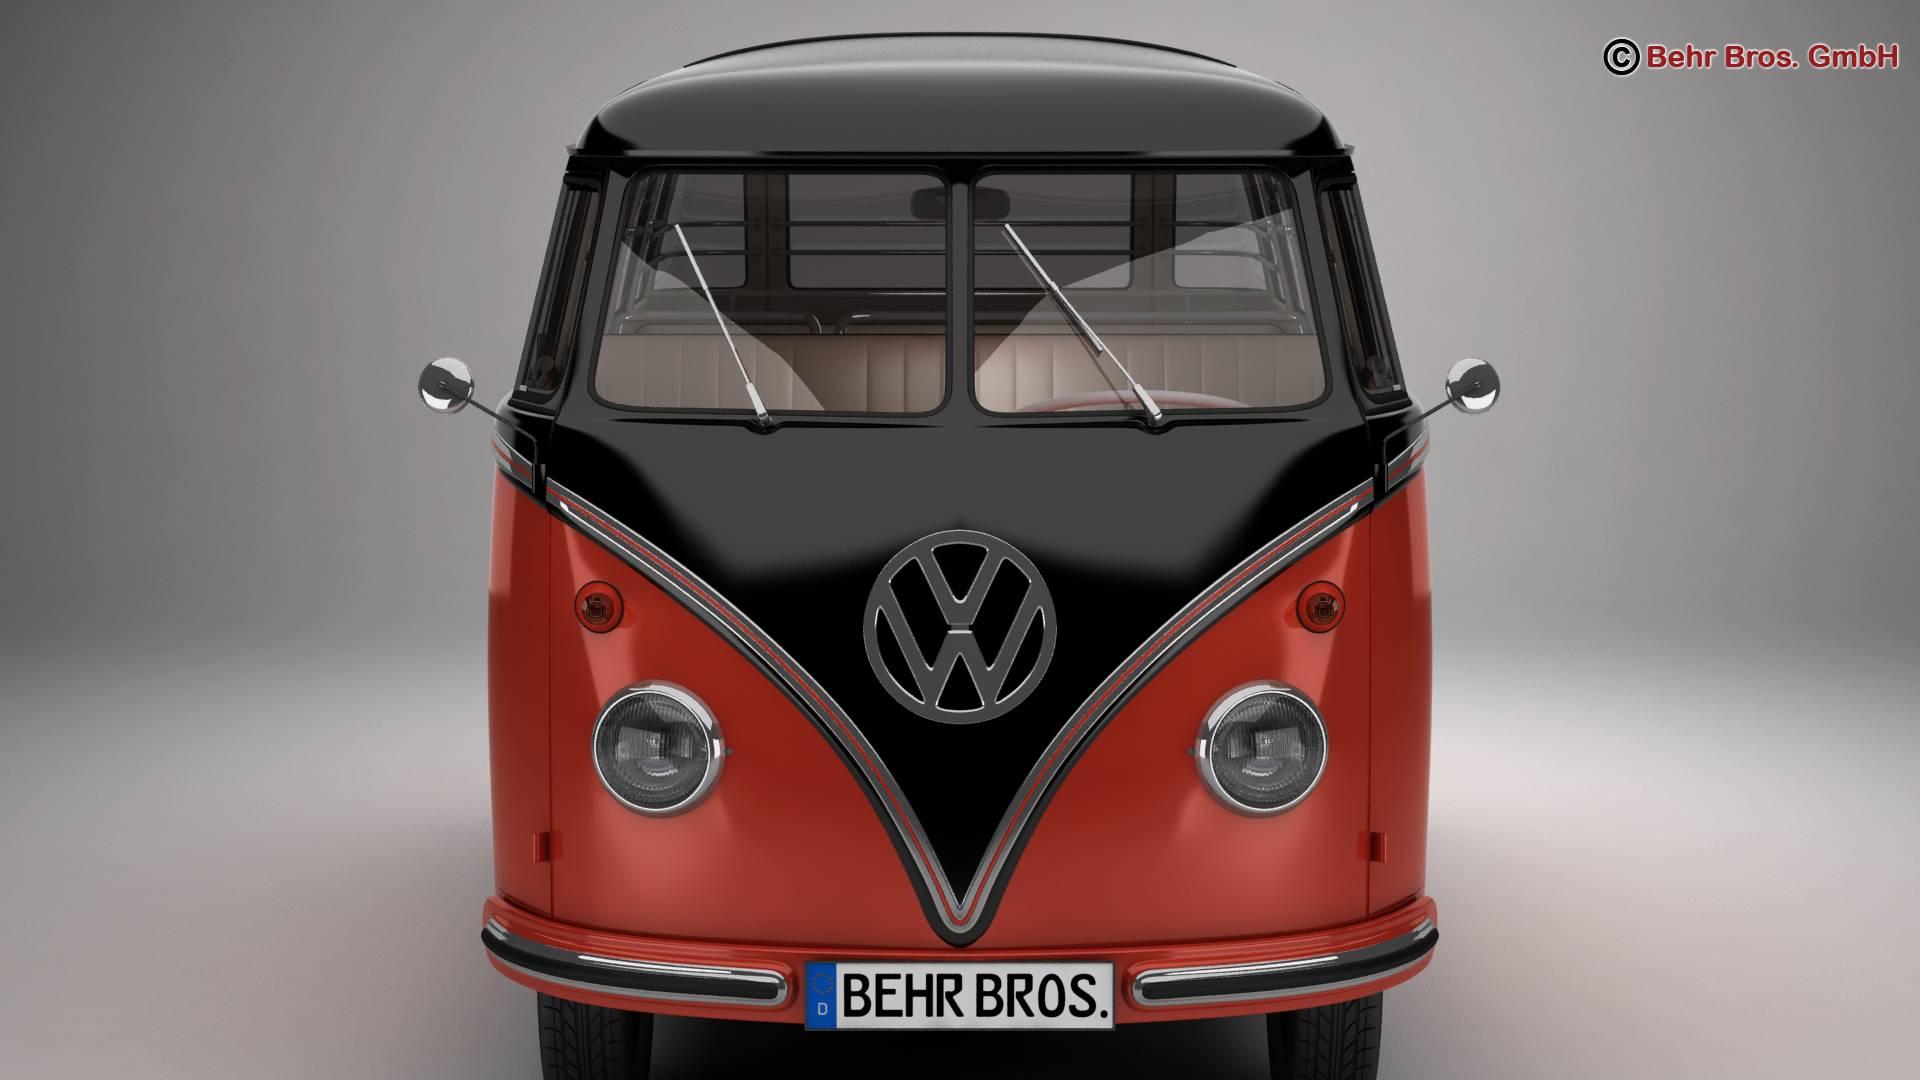 volkswagen type 2 samba 1959 3d model 3ds max fbx c4d lwo ma mb obj 217111